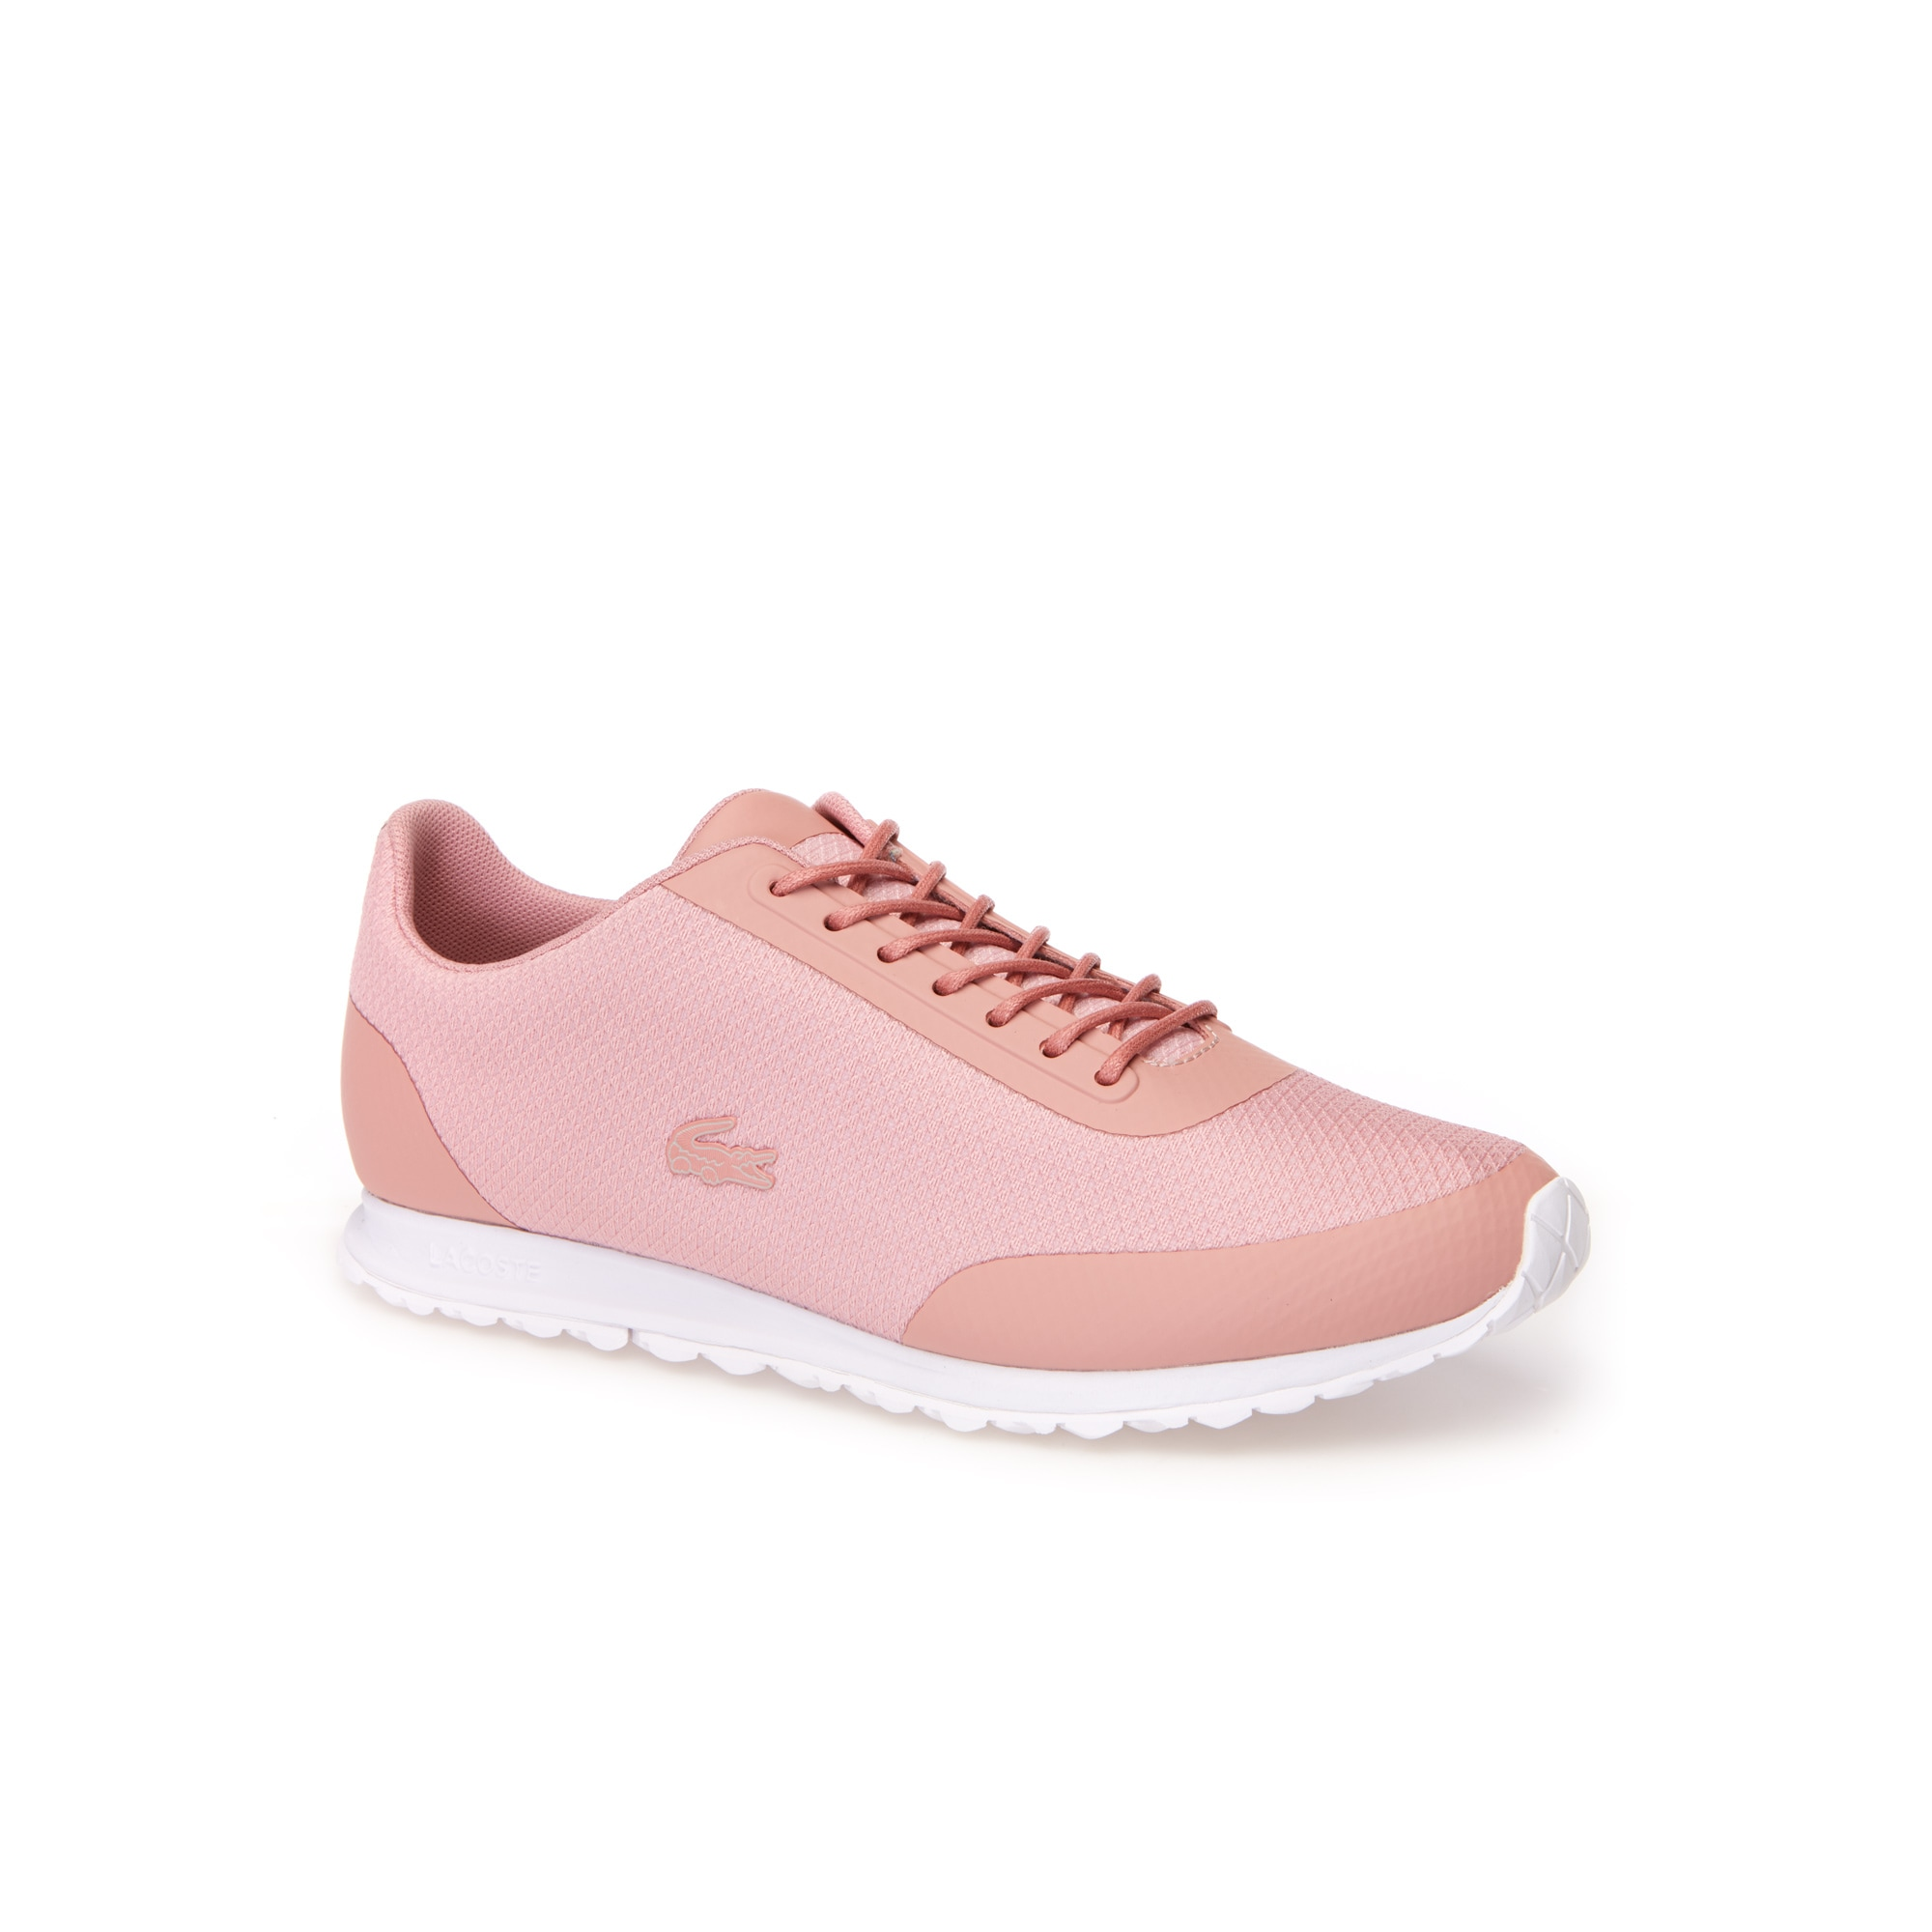 Sneakers Helaine Runner femme en textile